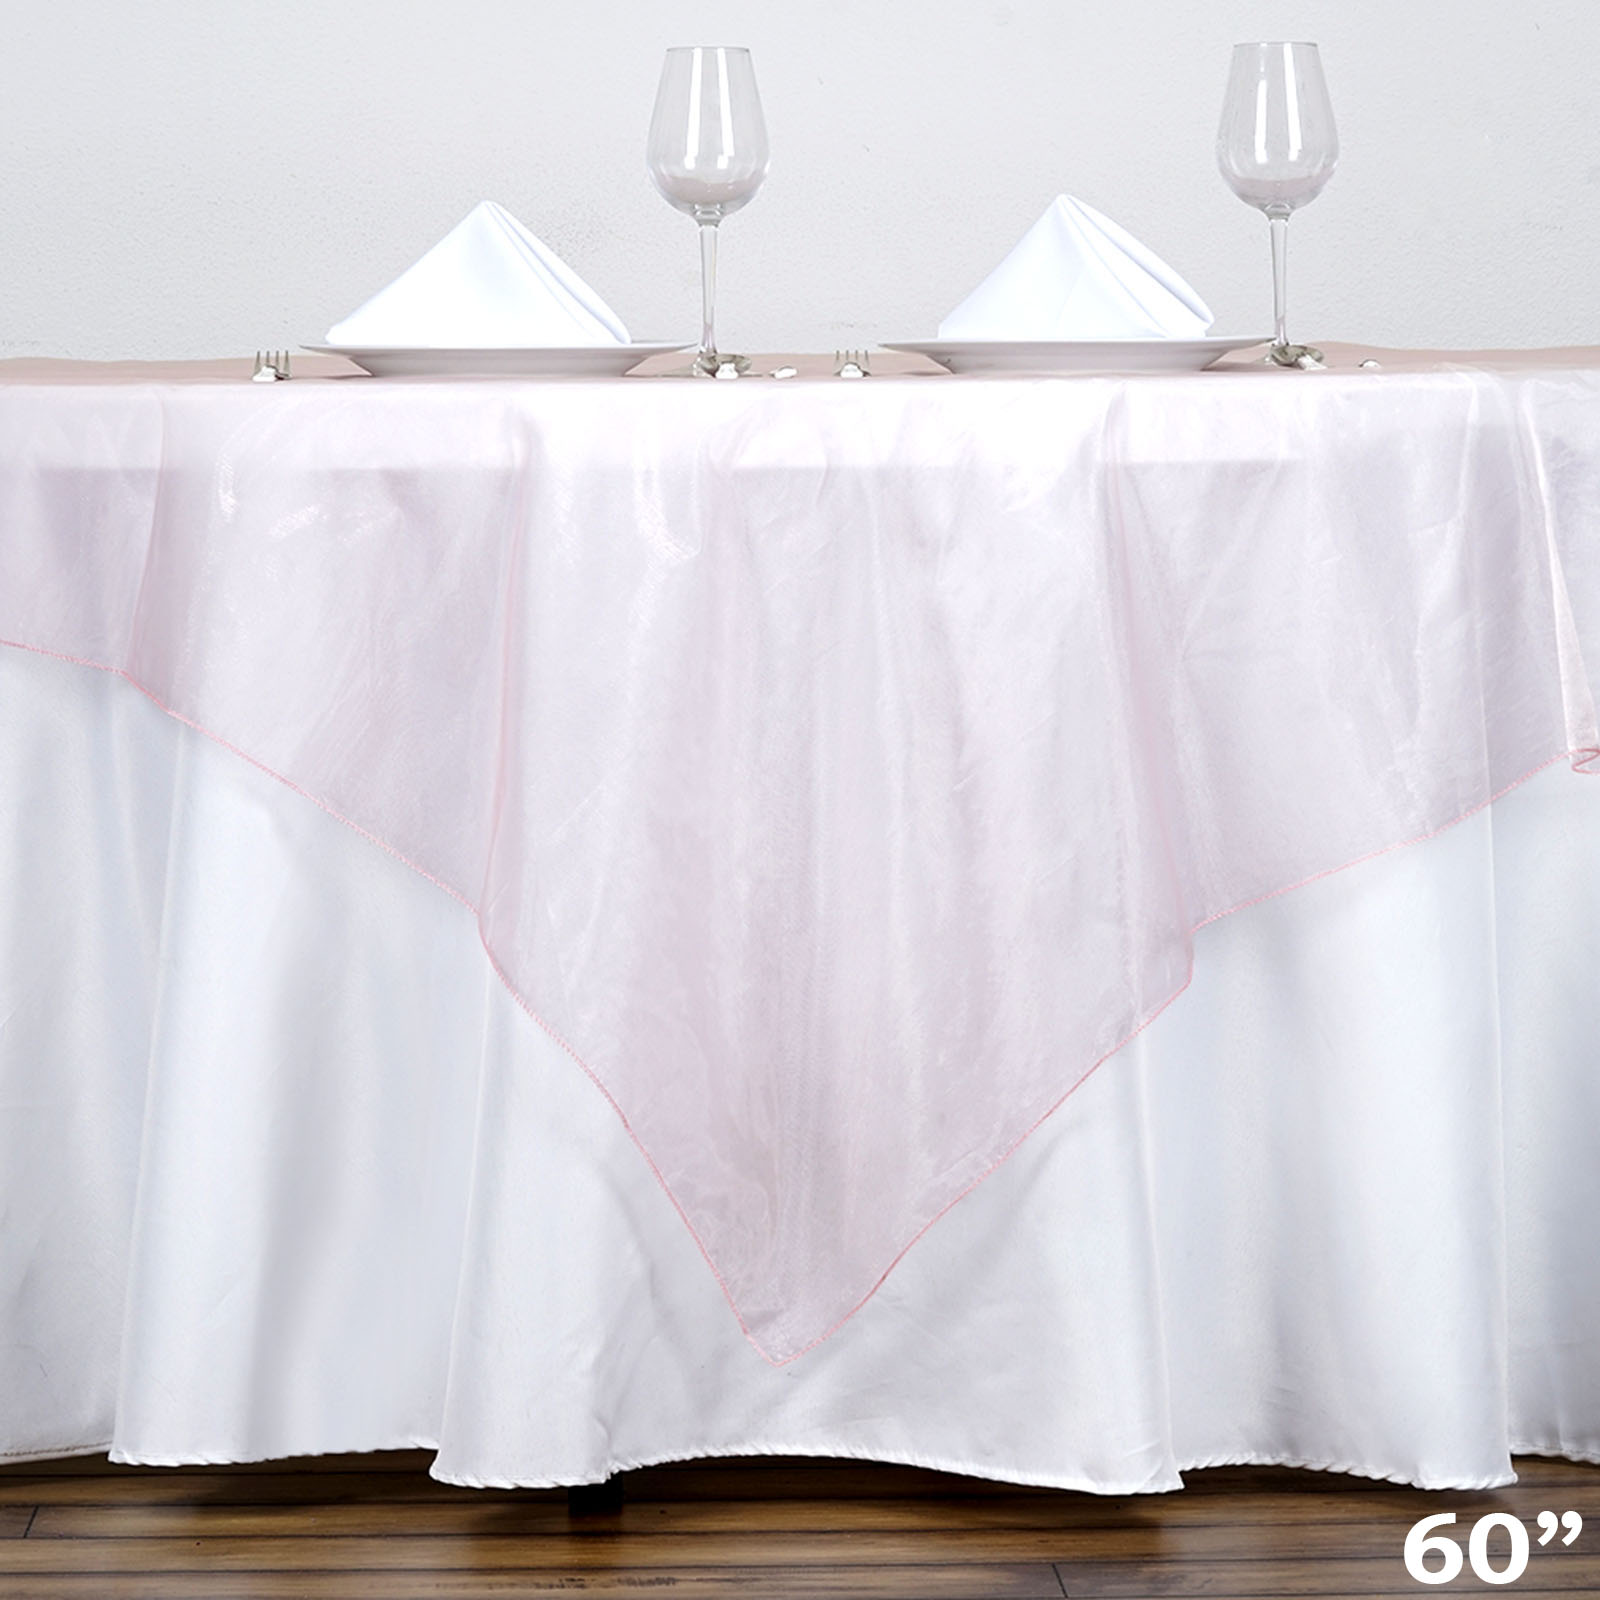 "BalsaCircle 60"" x 60"" Sheer Organza Table Overlays Wedding Party Reception... by"